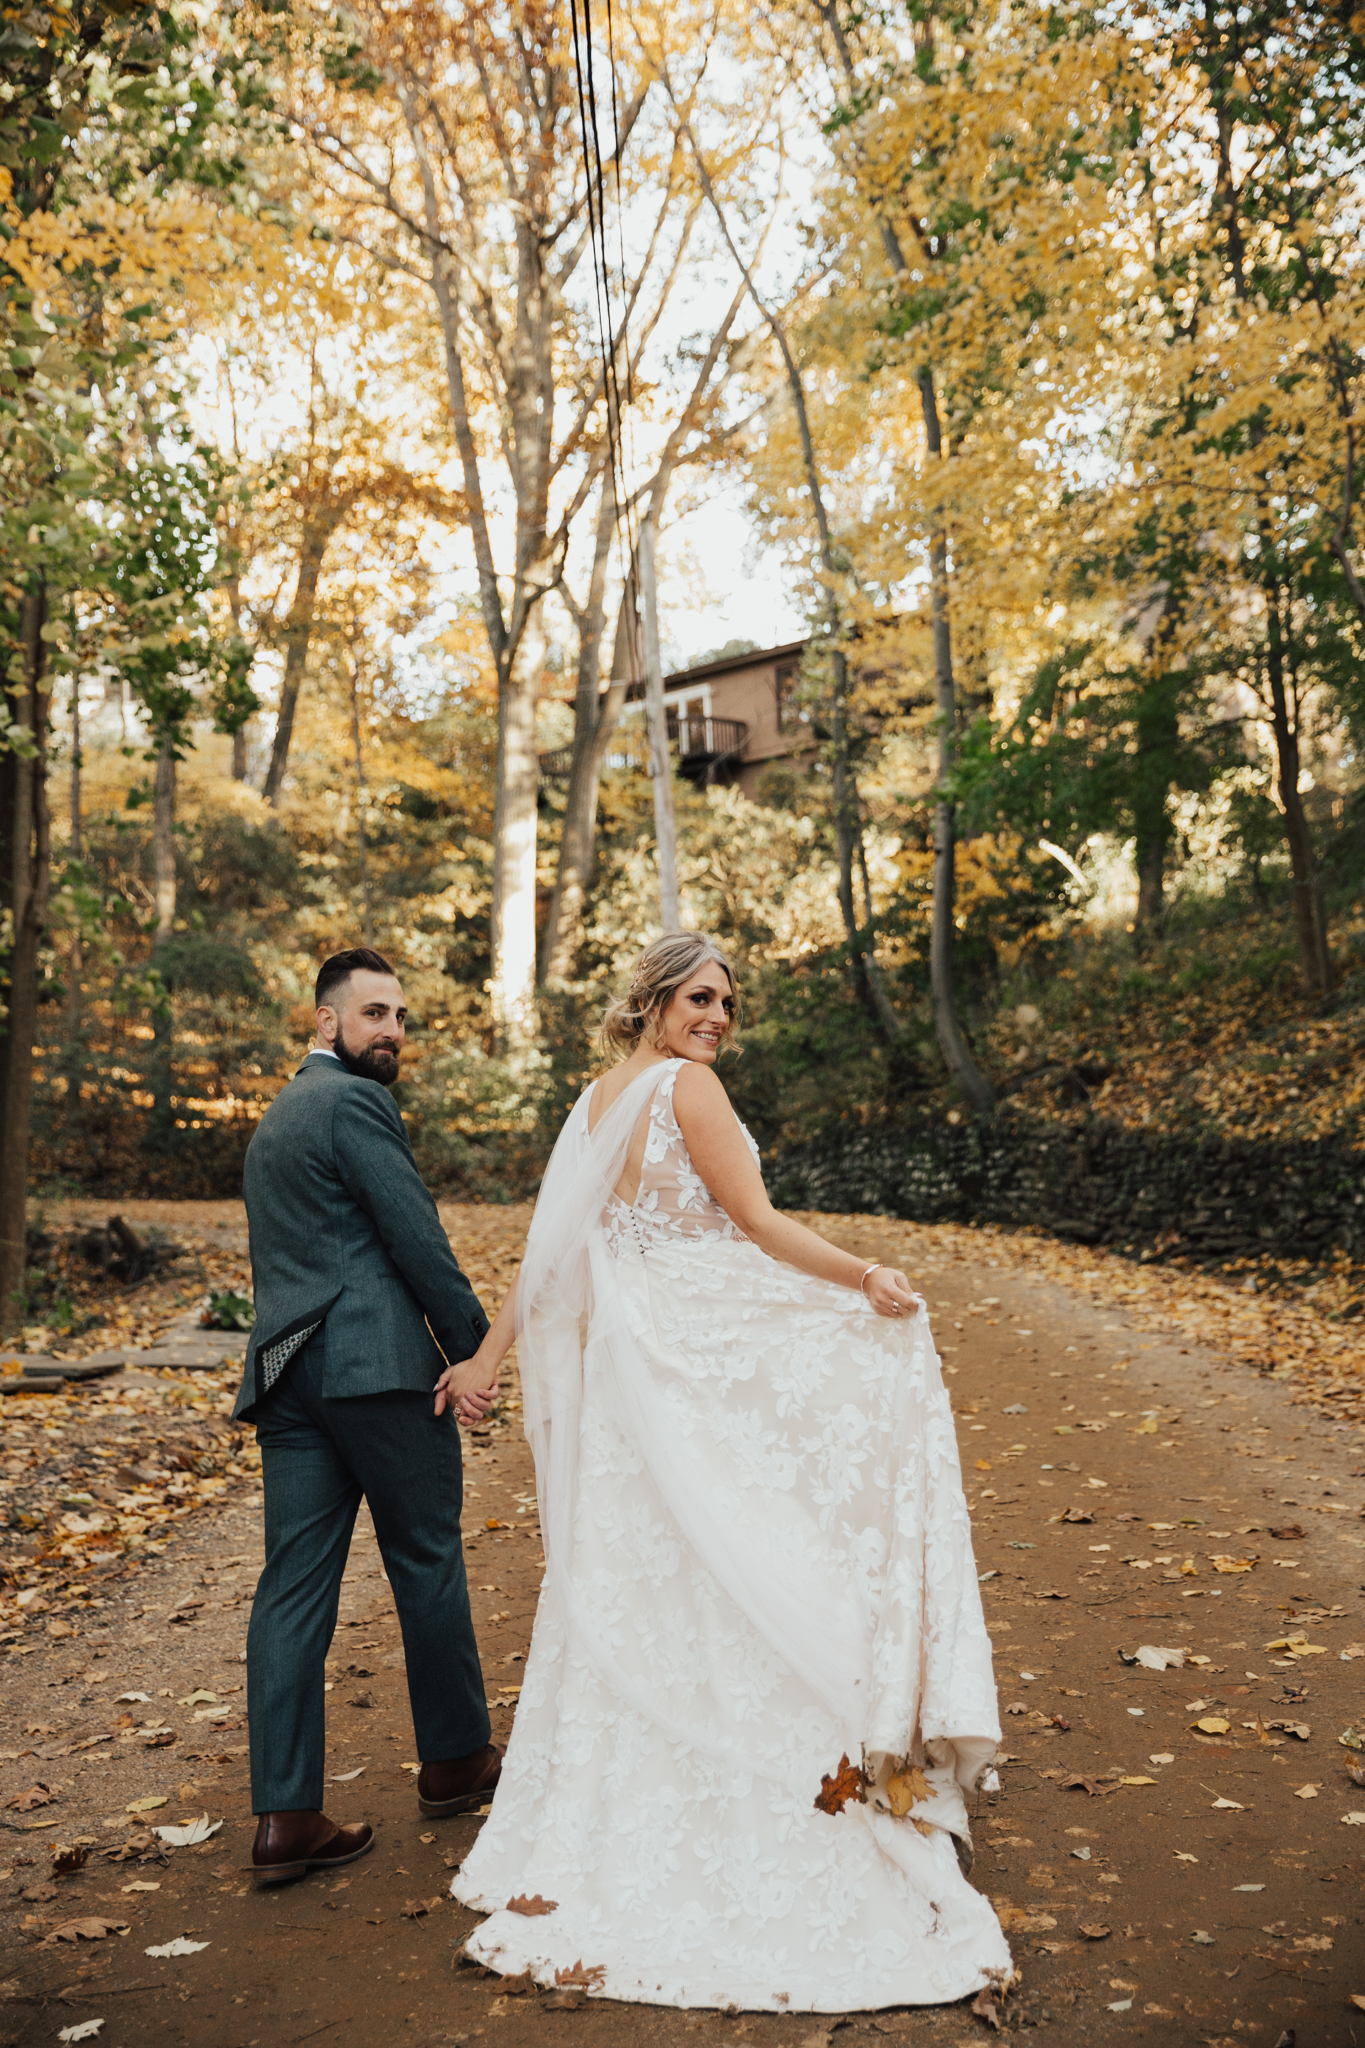 Bhldn wedding dress NYC